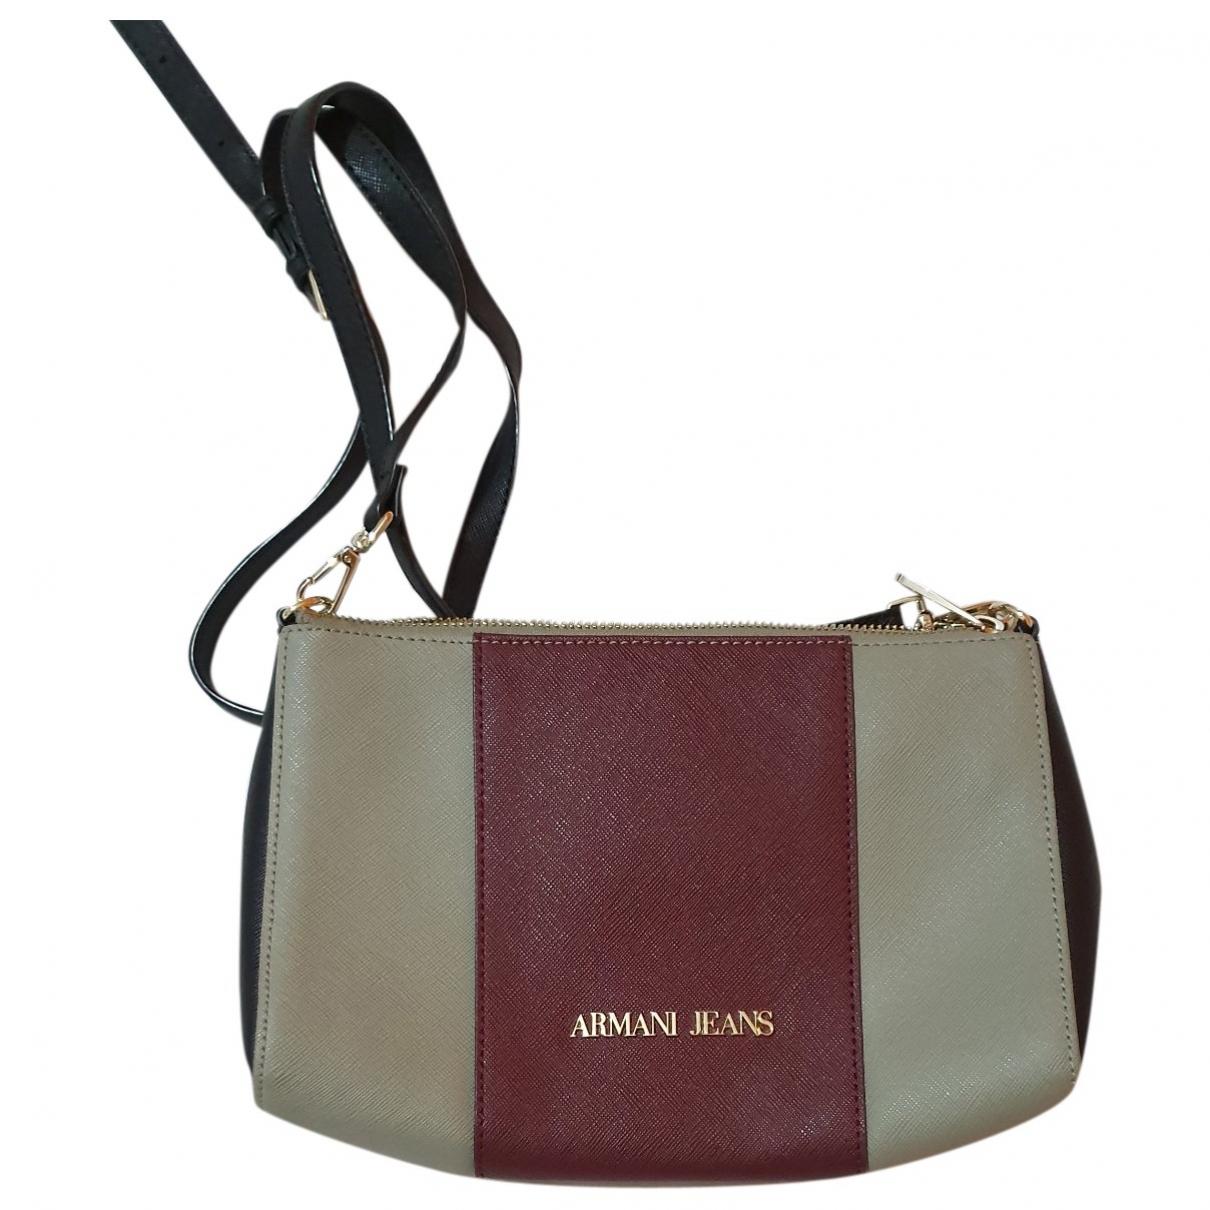 Armani Jeans \N Grey Leather Clutch bag for Women \N